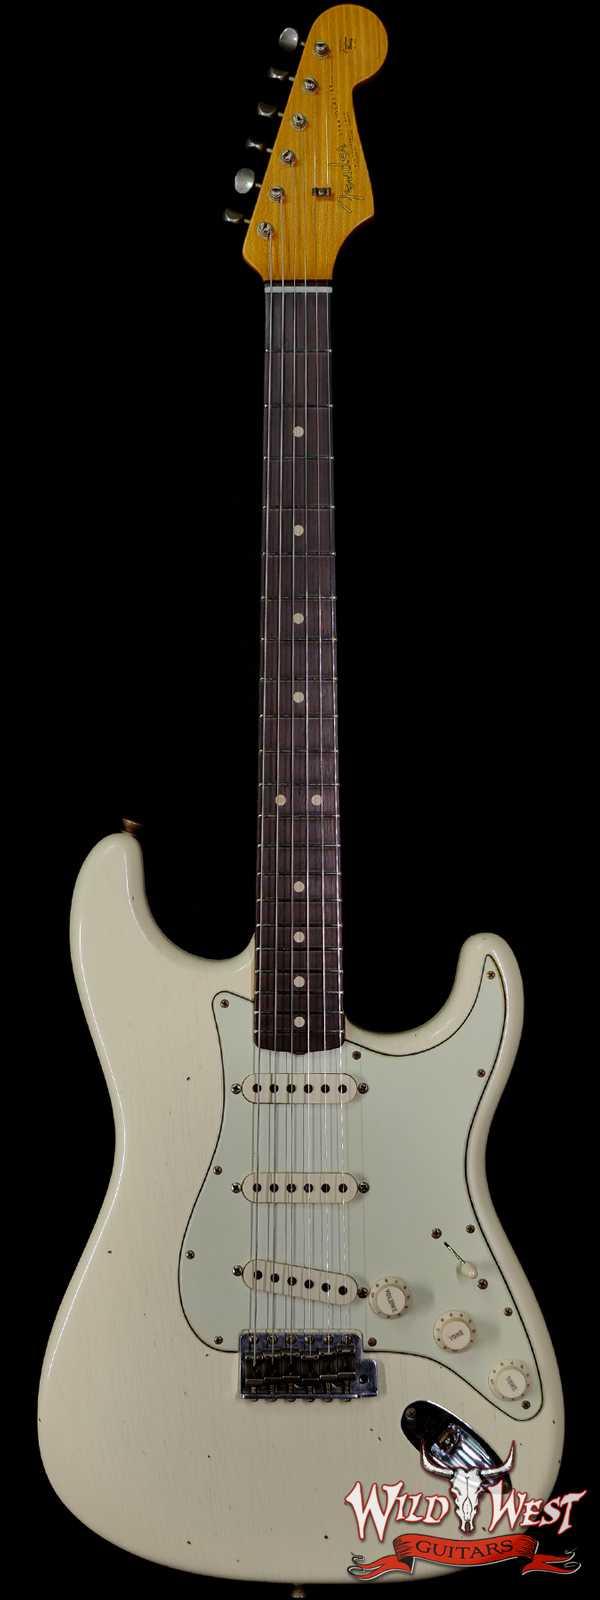 Fender Custom Shop 1963 Stratocaster Hand-Wound Pickups Journeyman Relic Vintage White